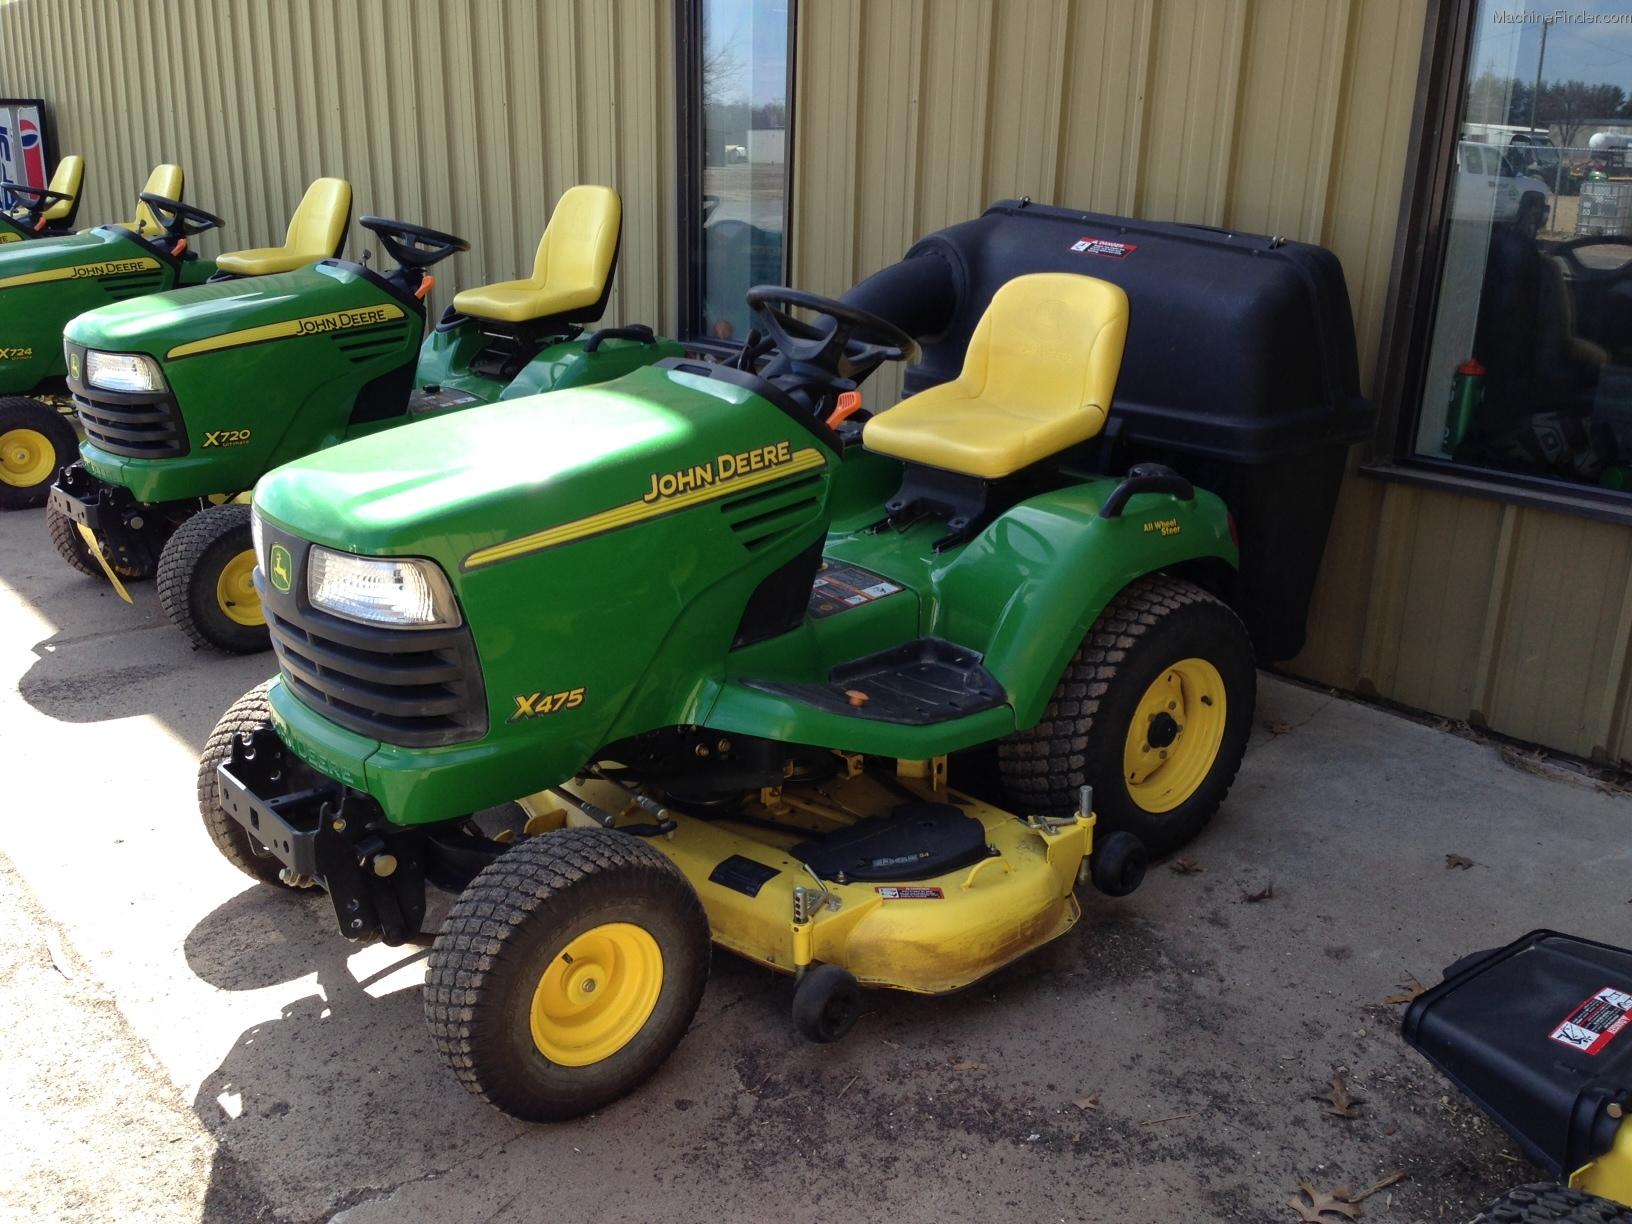 2002 John Deere X475 Lawn & Garden and Commercial Mowing ...